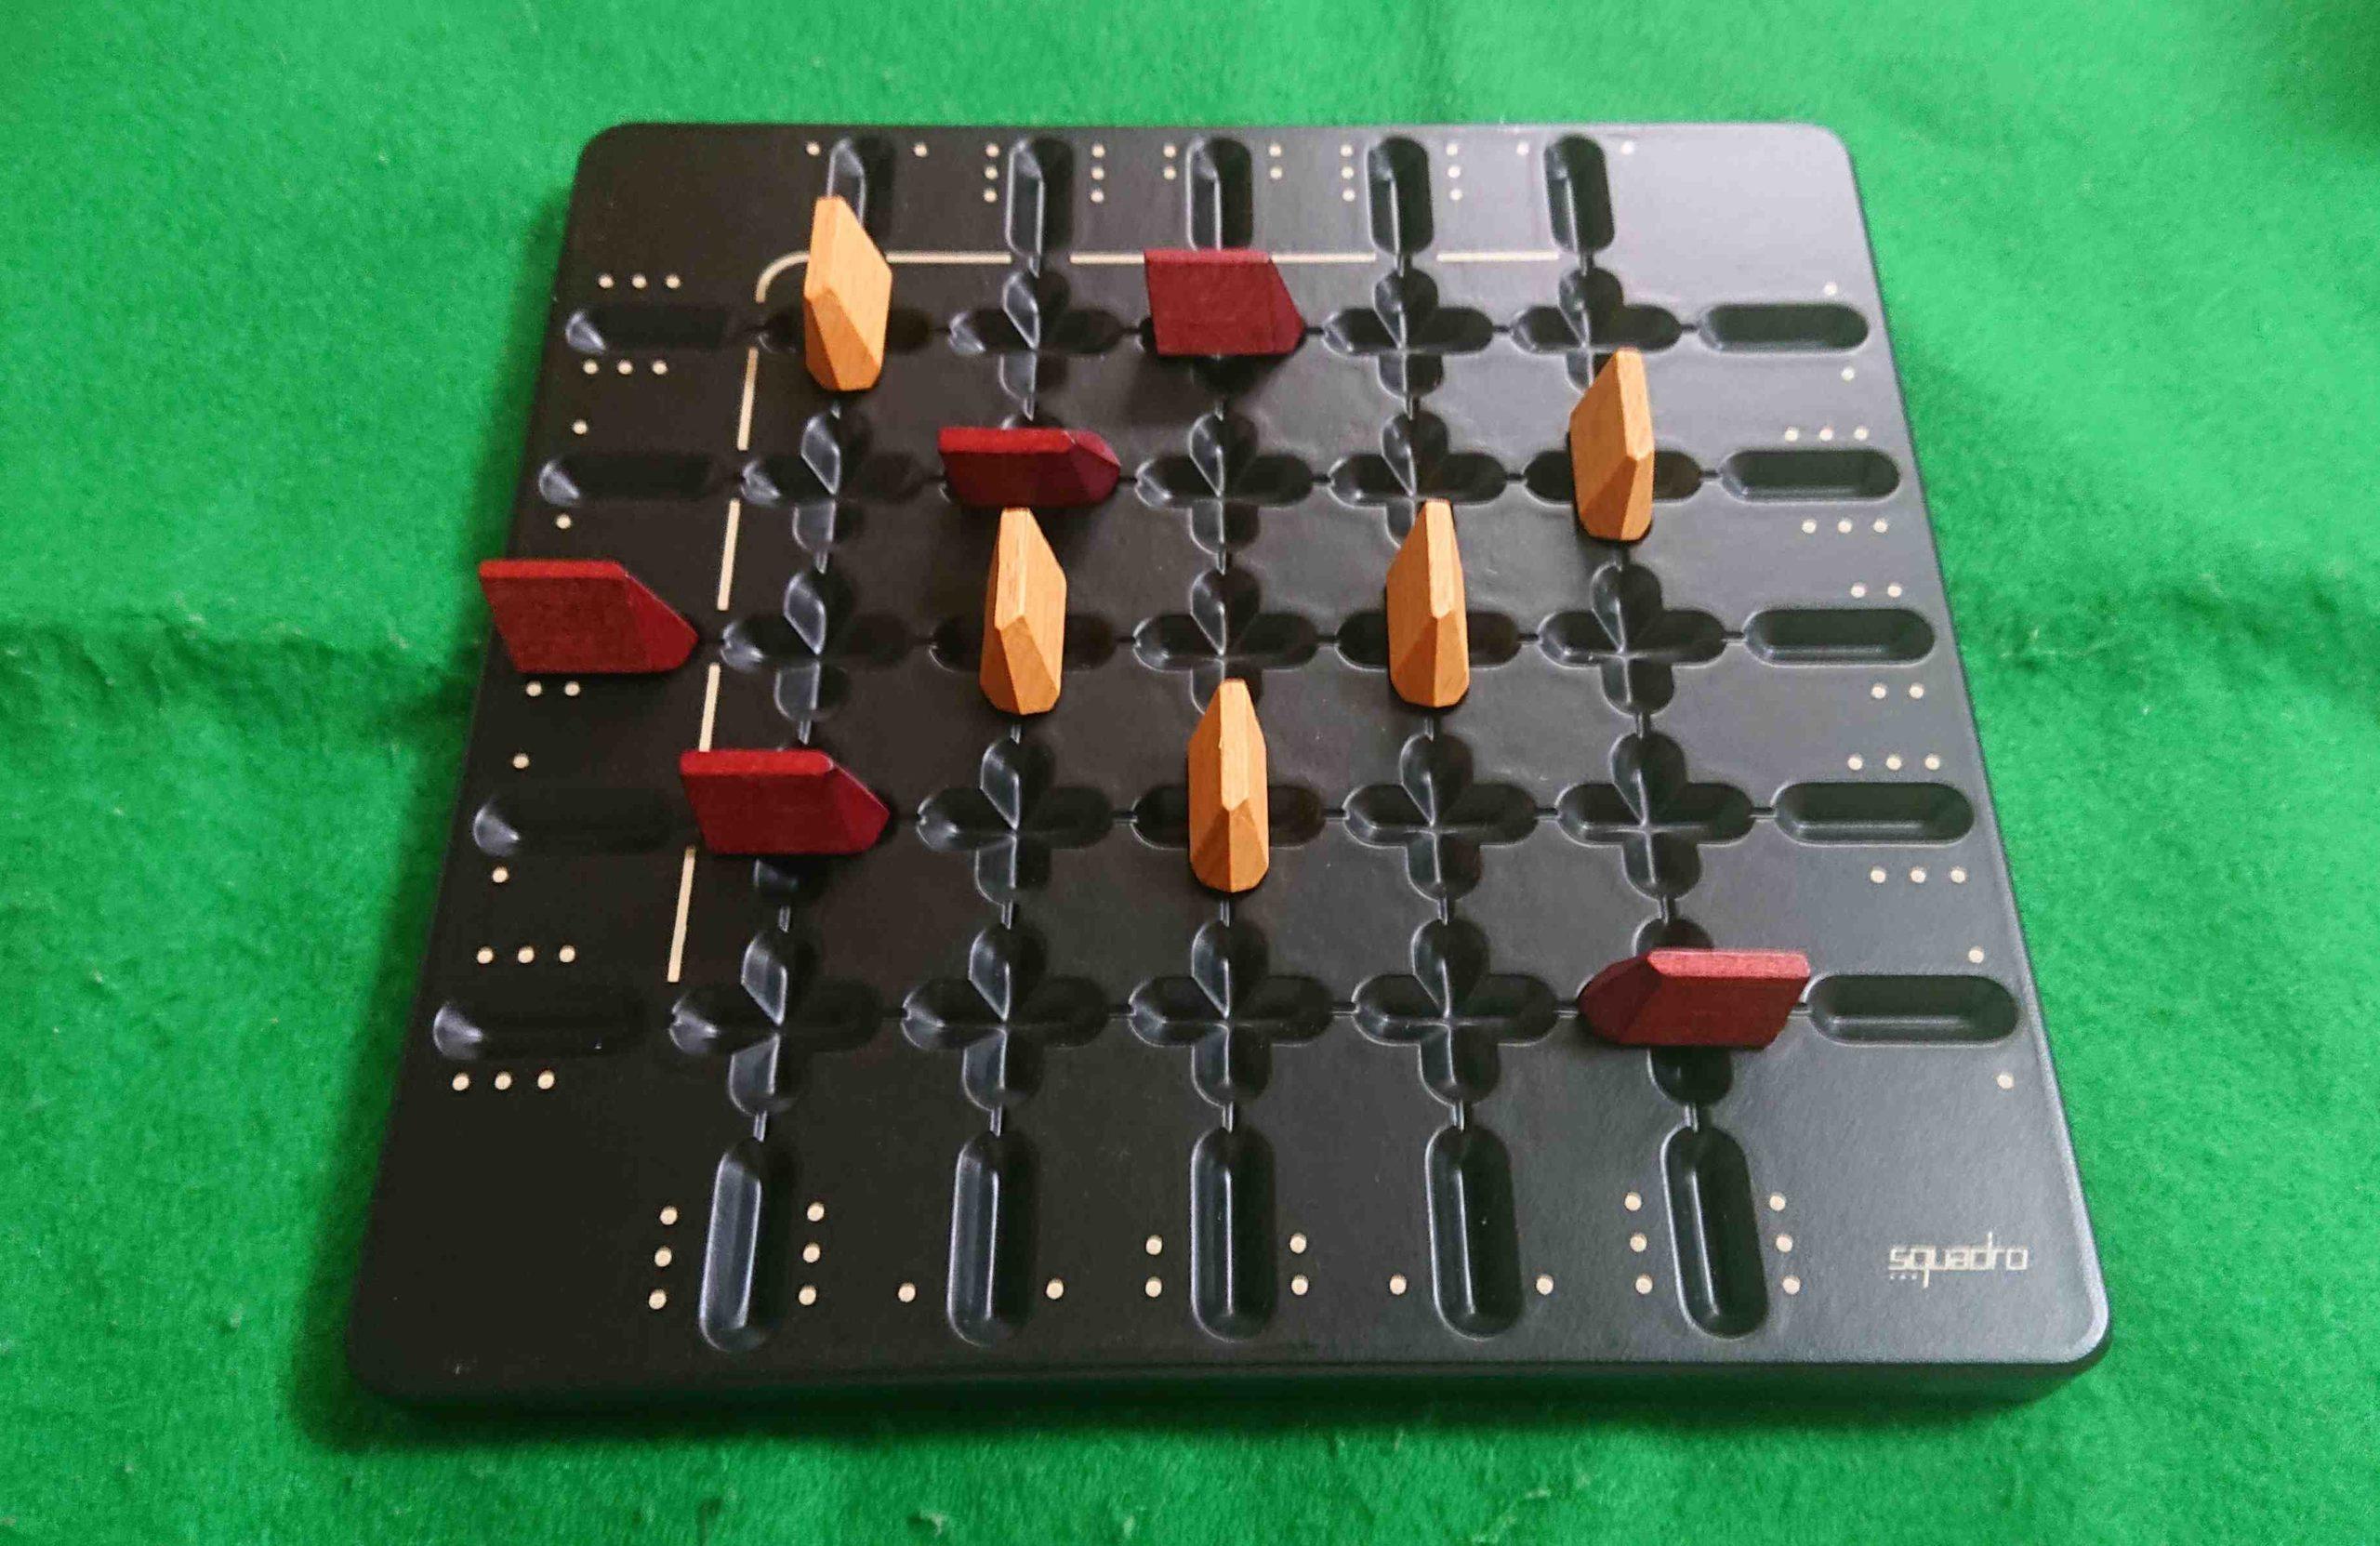 SQUADRO(スクアドロ) ルール&レビュー アブストラクト系 ボードゲーム